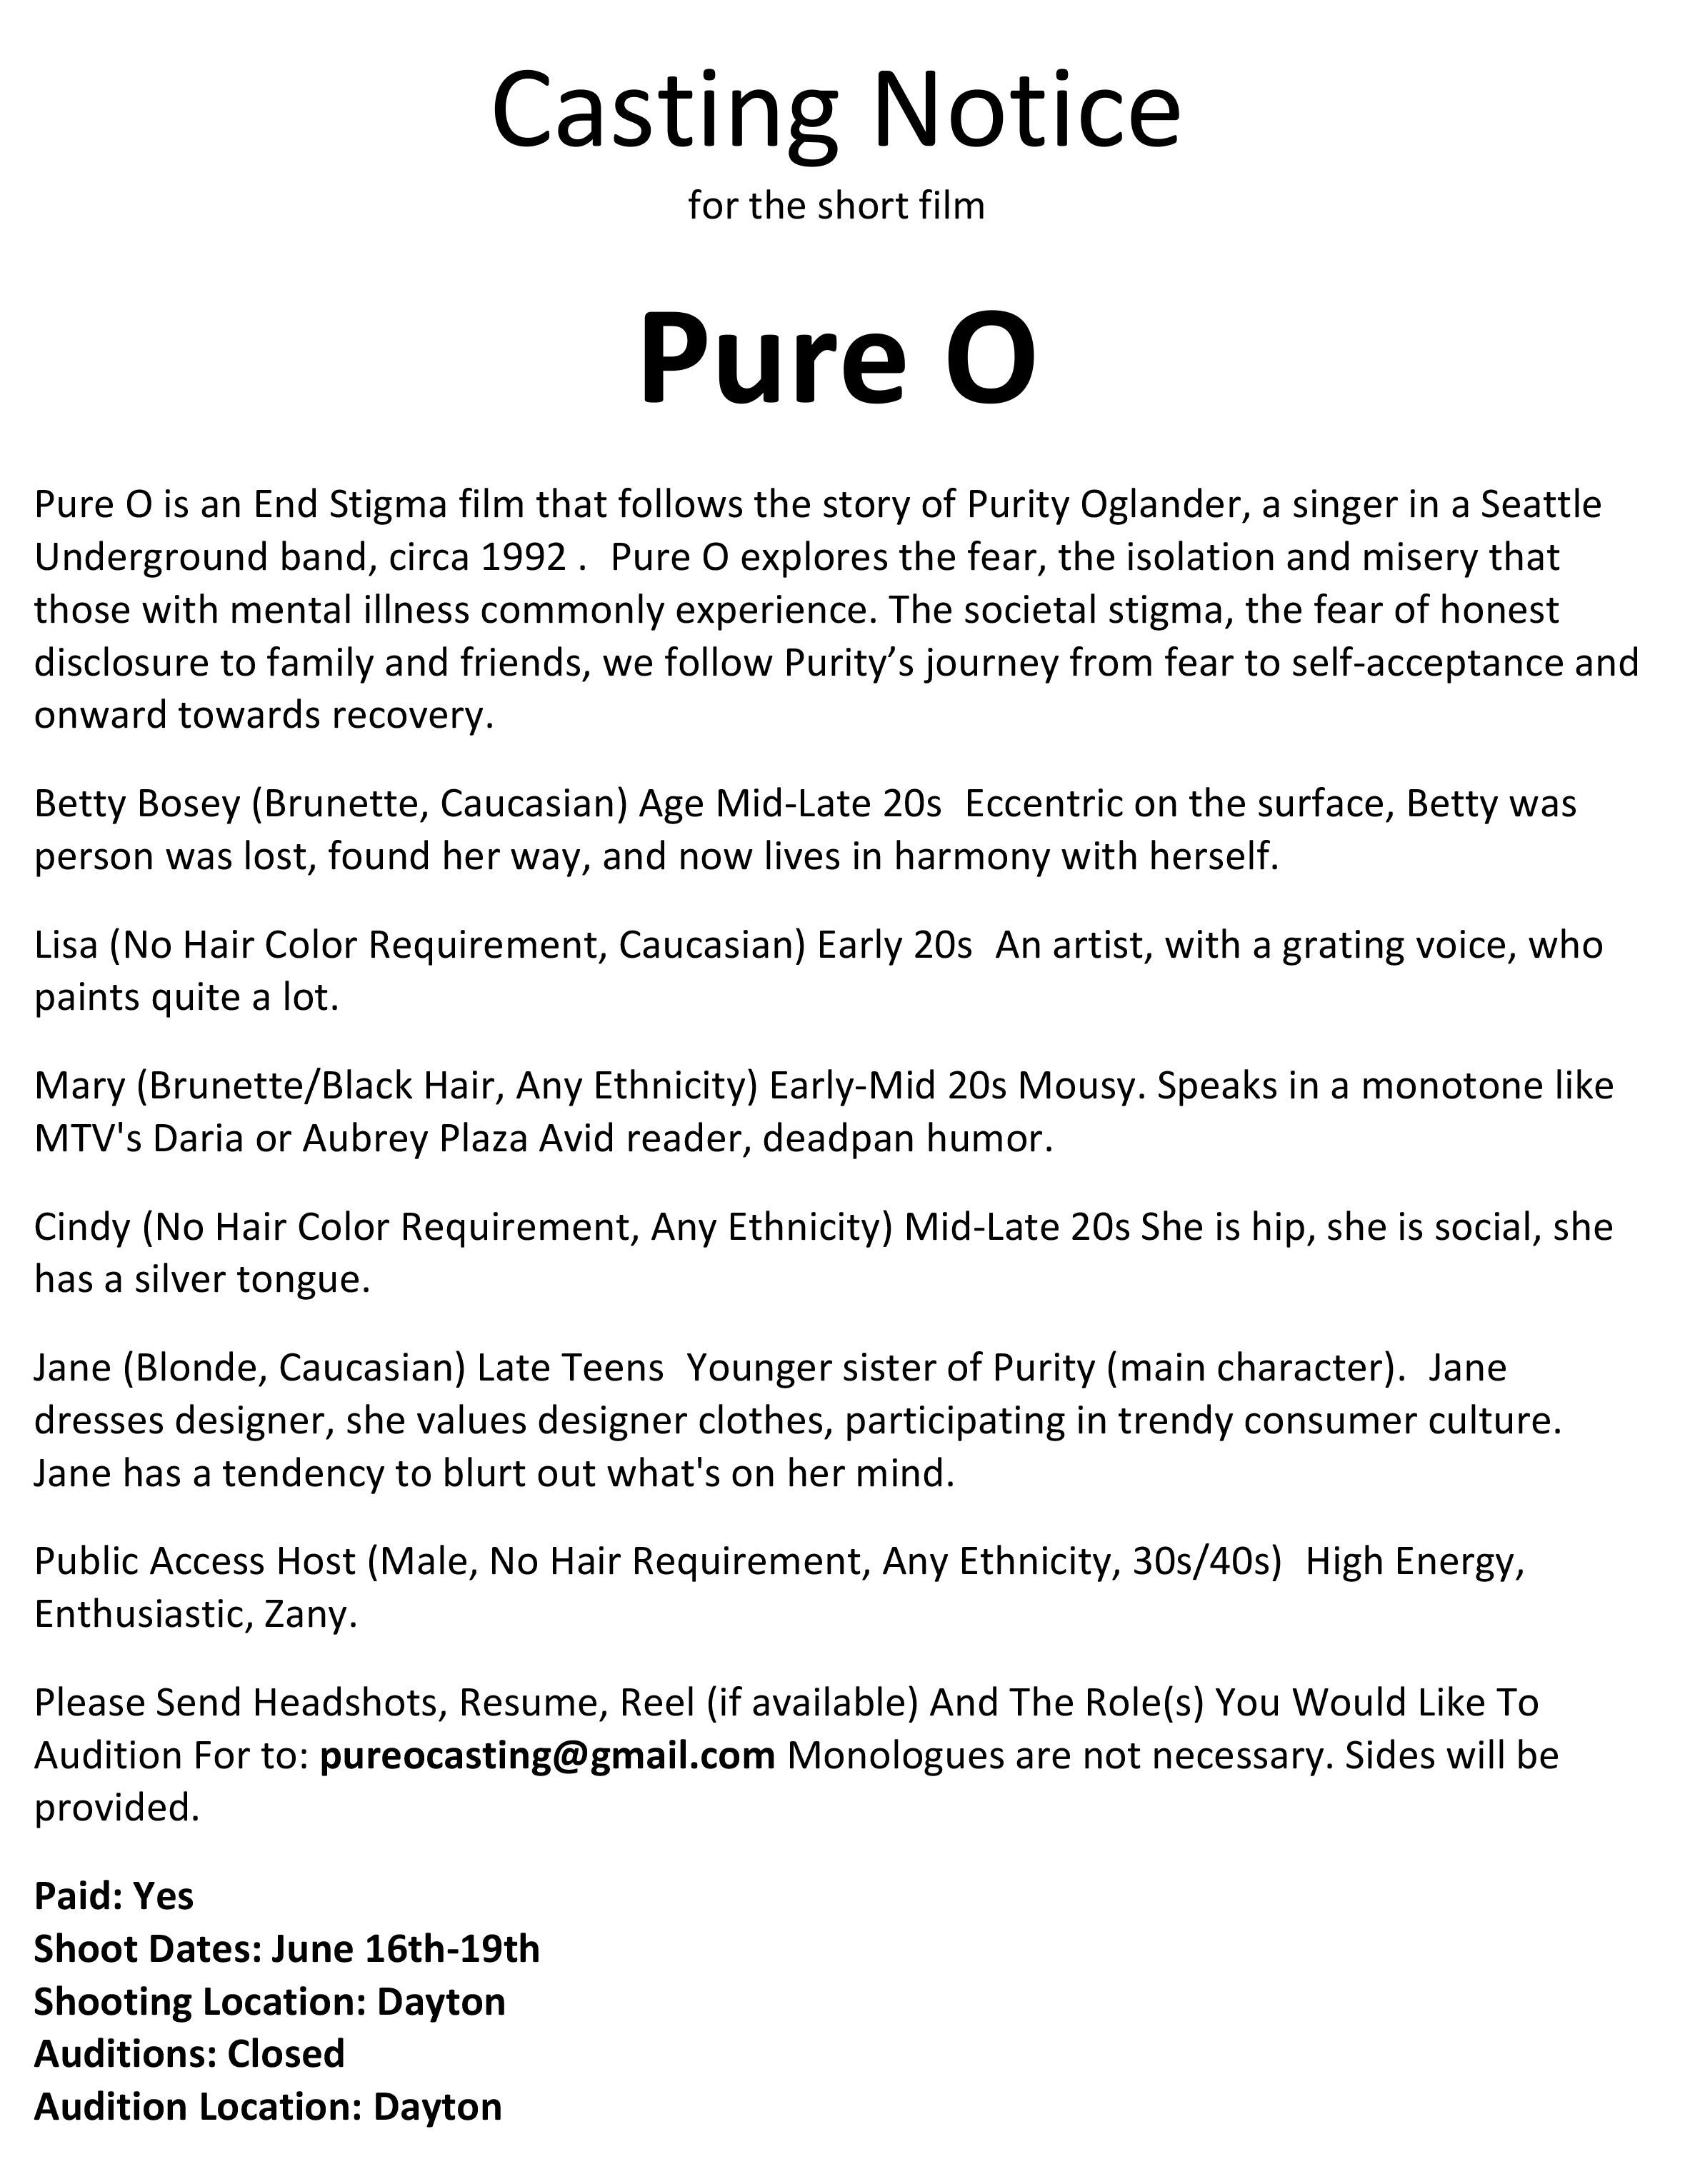 FILMDAYTON_WEBSITE_crew/casting calls_Casting Notice Pure O